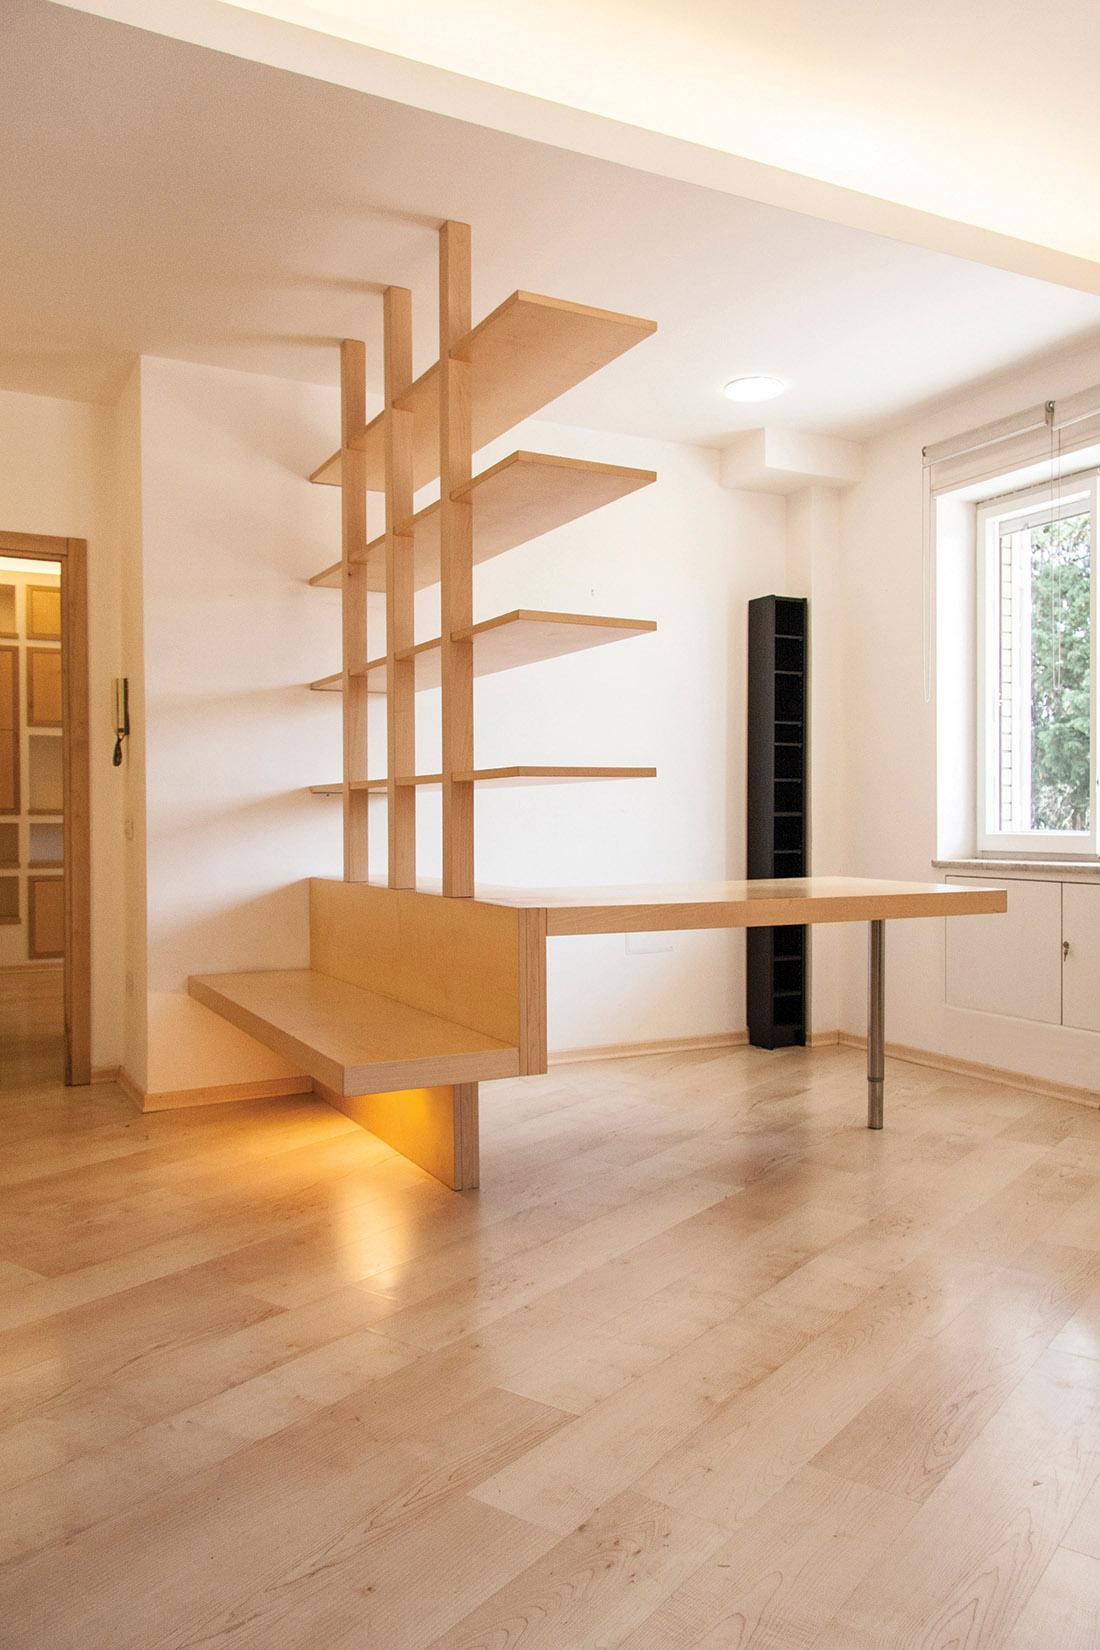 kangei-e-studio-kangei-panca-libreria-scrivania-in-legno-e-ferro